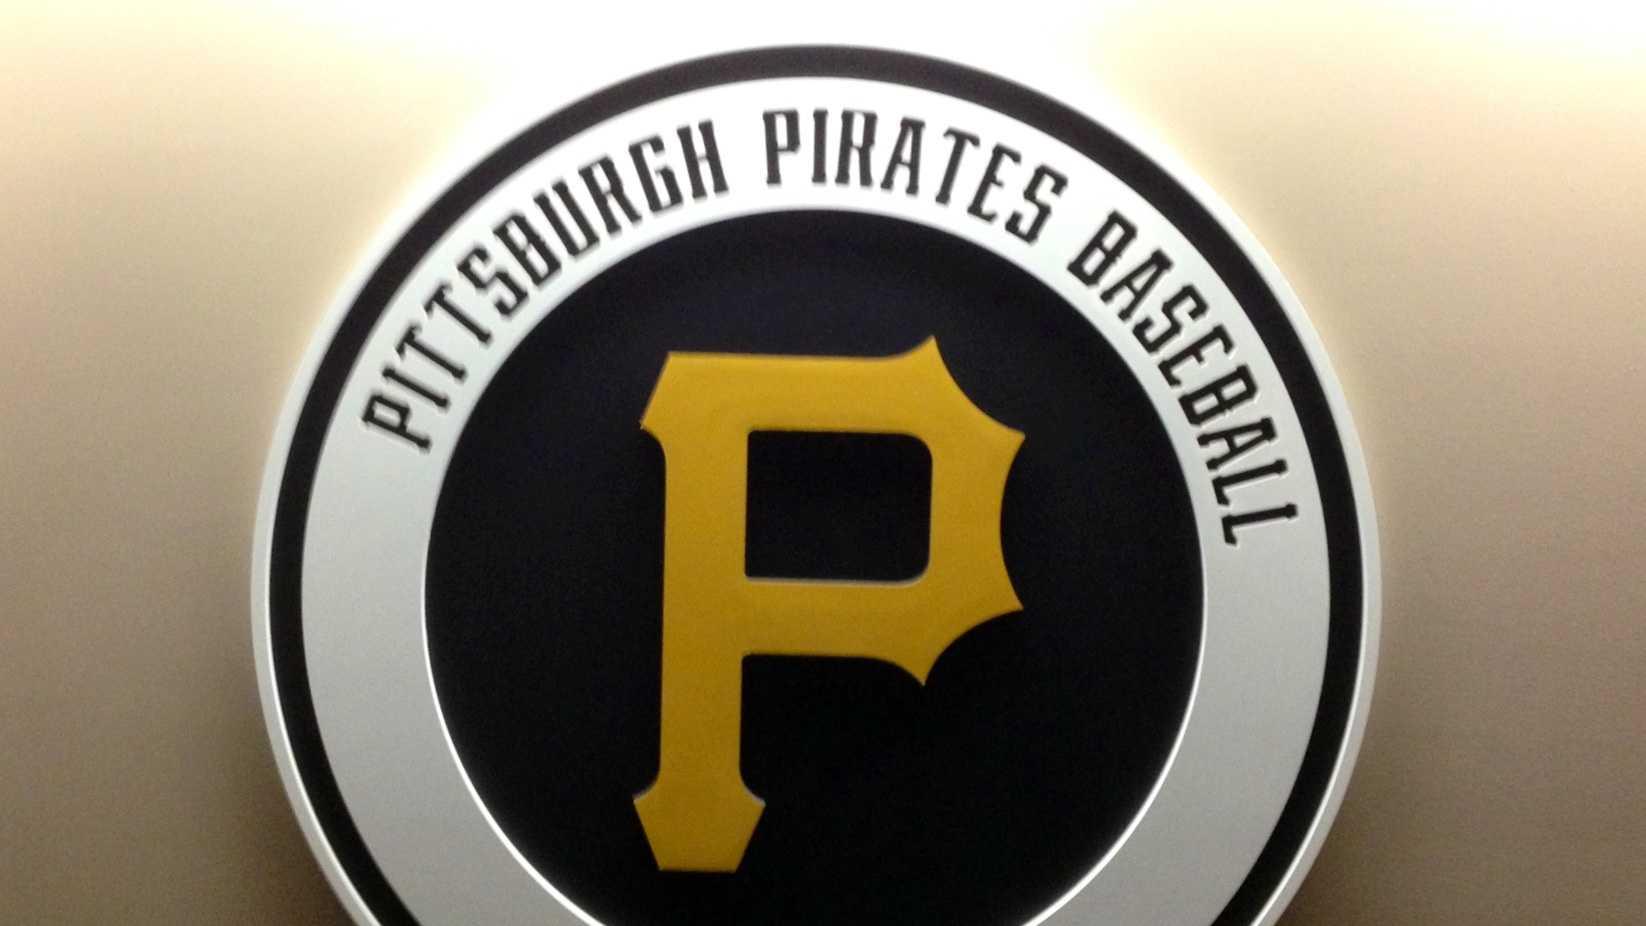 The Pittsburgh Pirates locker room